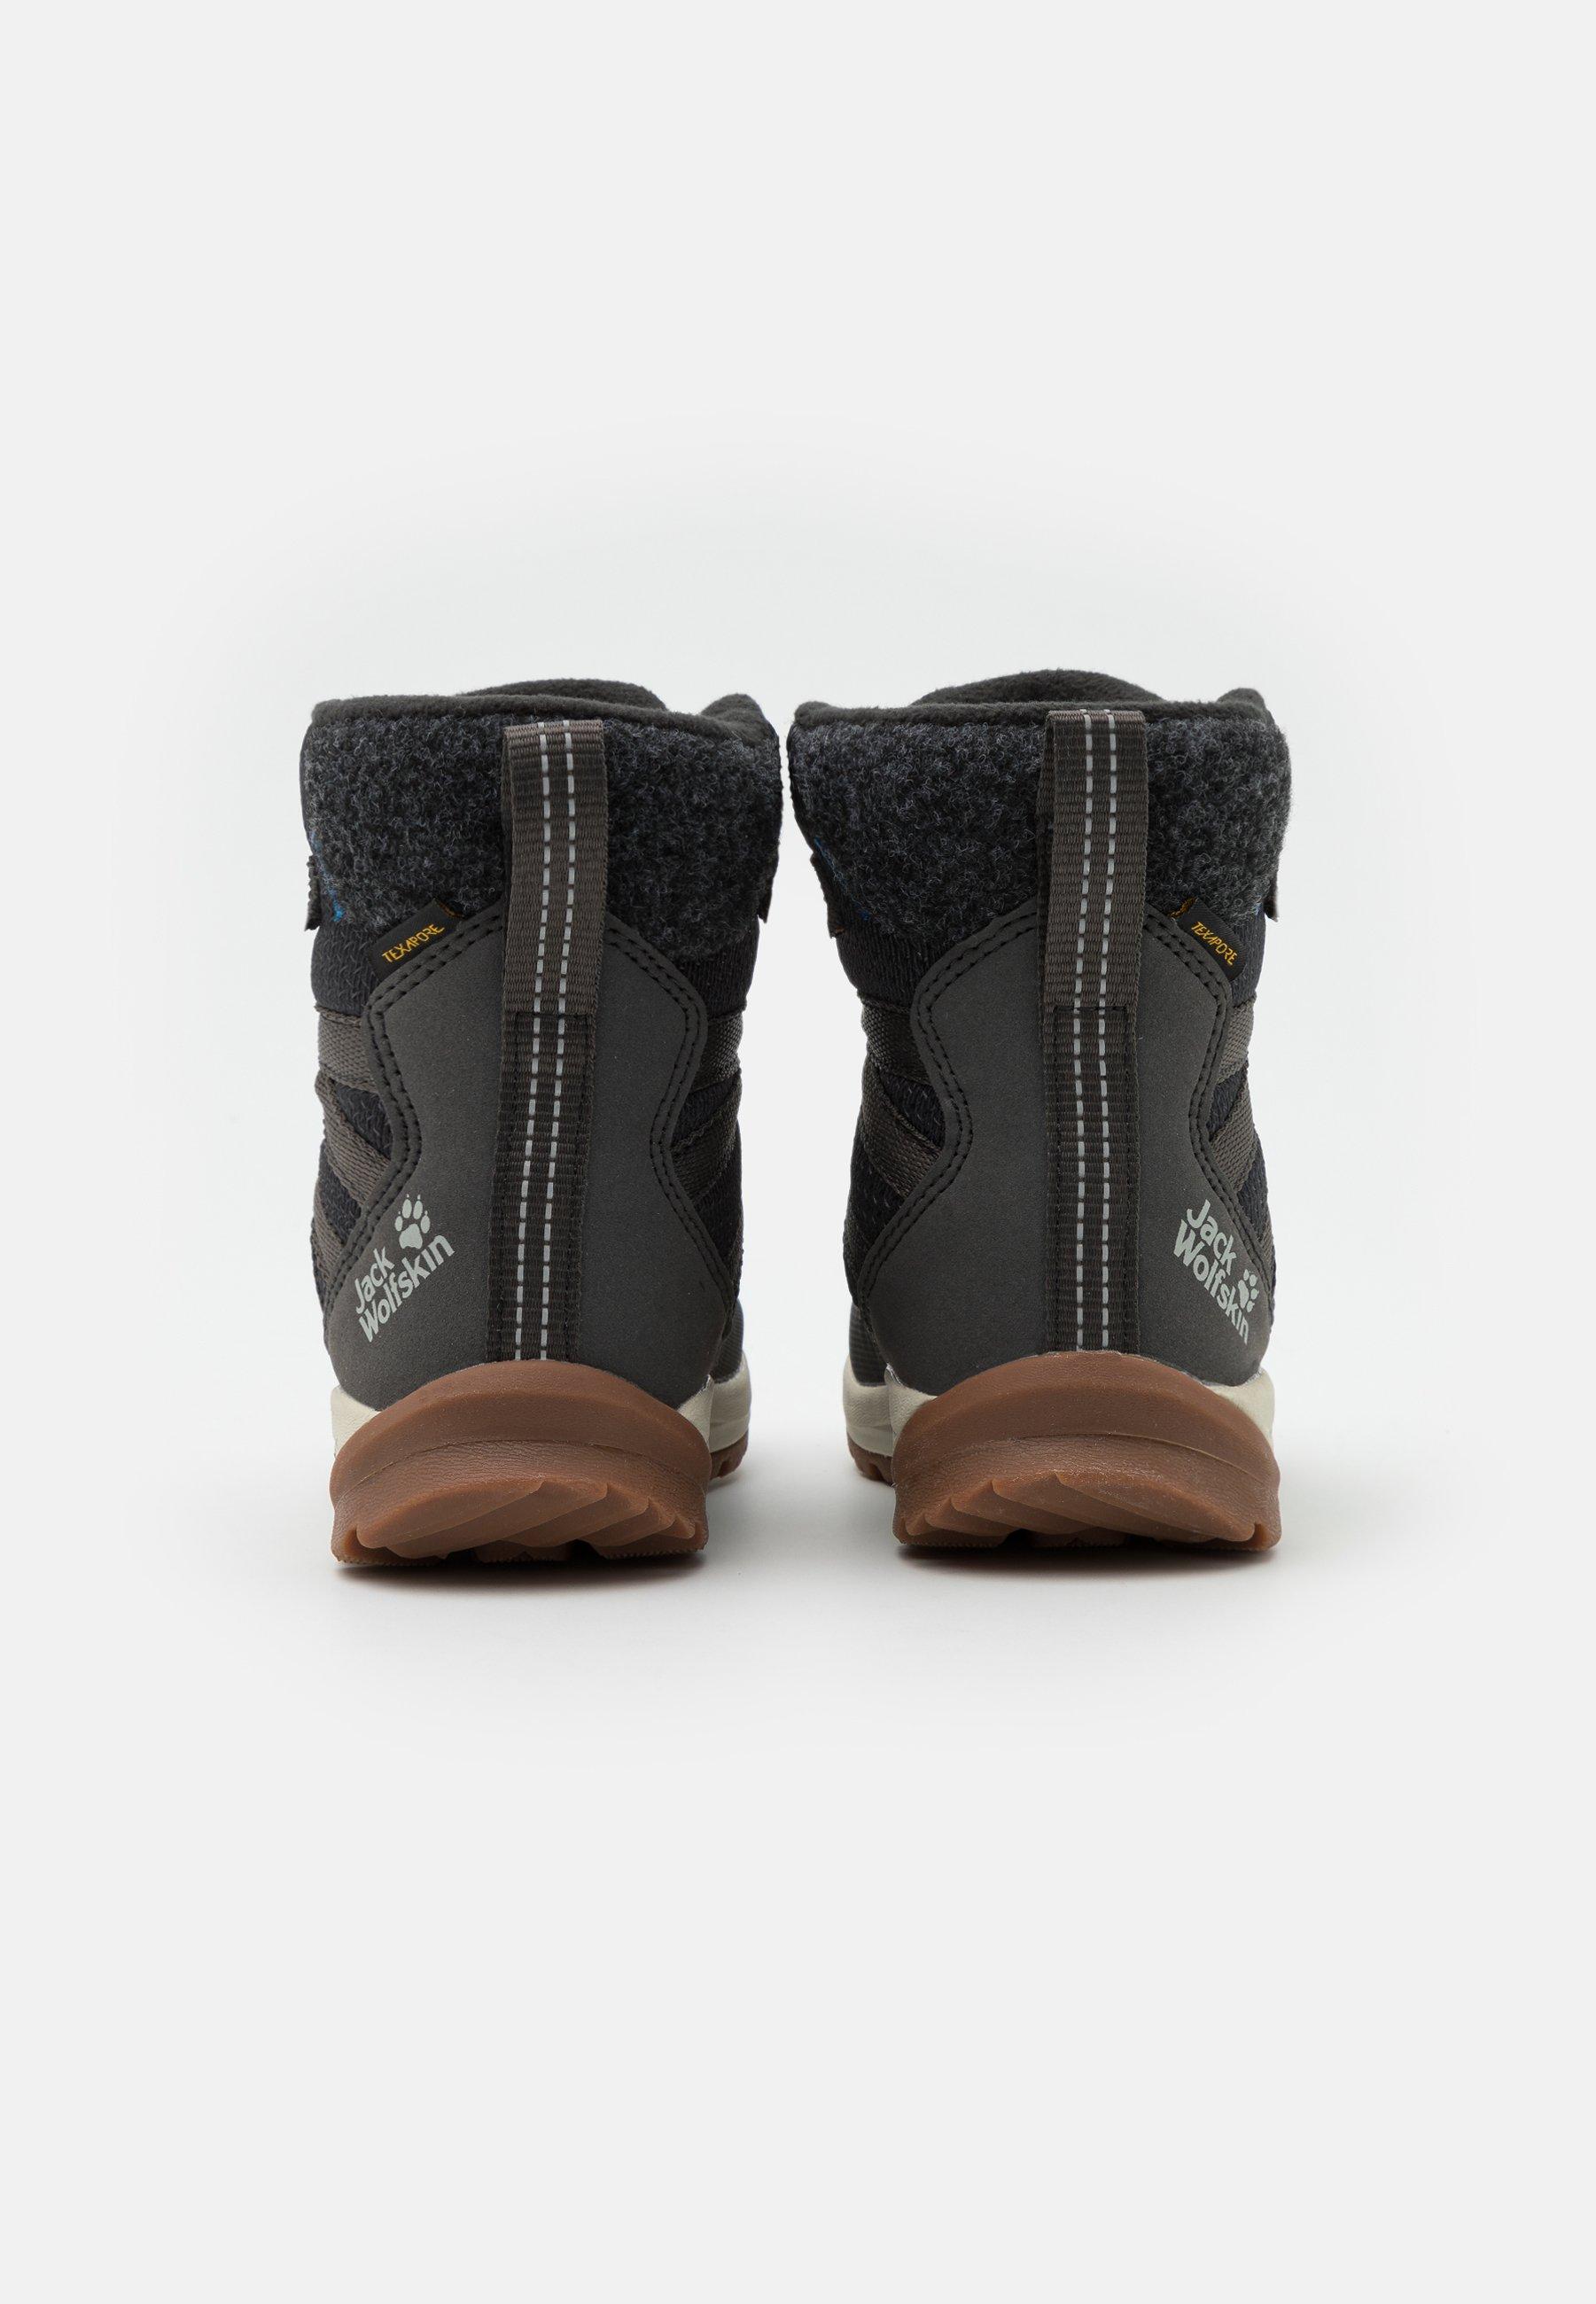 Enfant POLAR BEAR TEXAPORE HIGH UNISEX - Bottes de neige